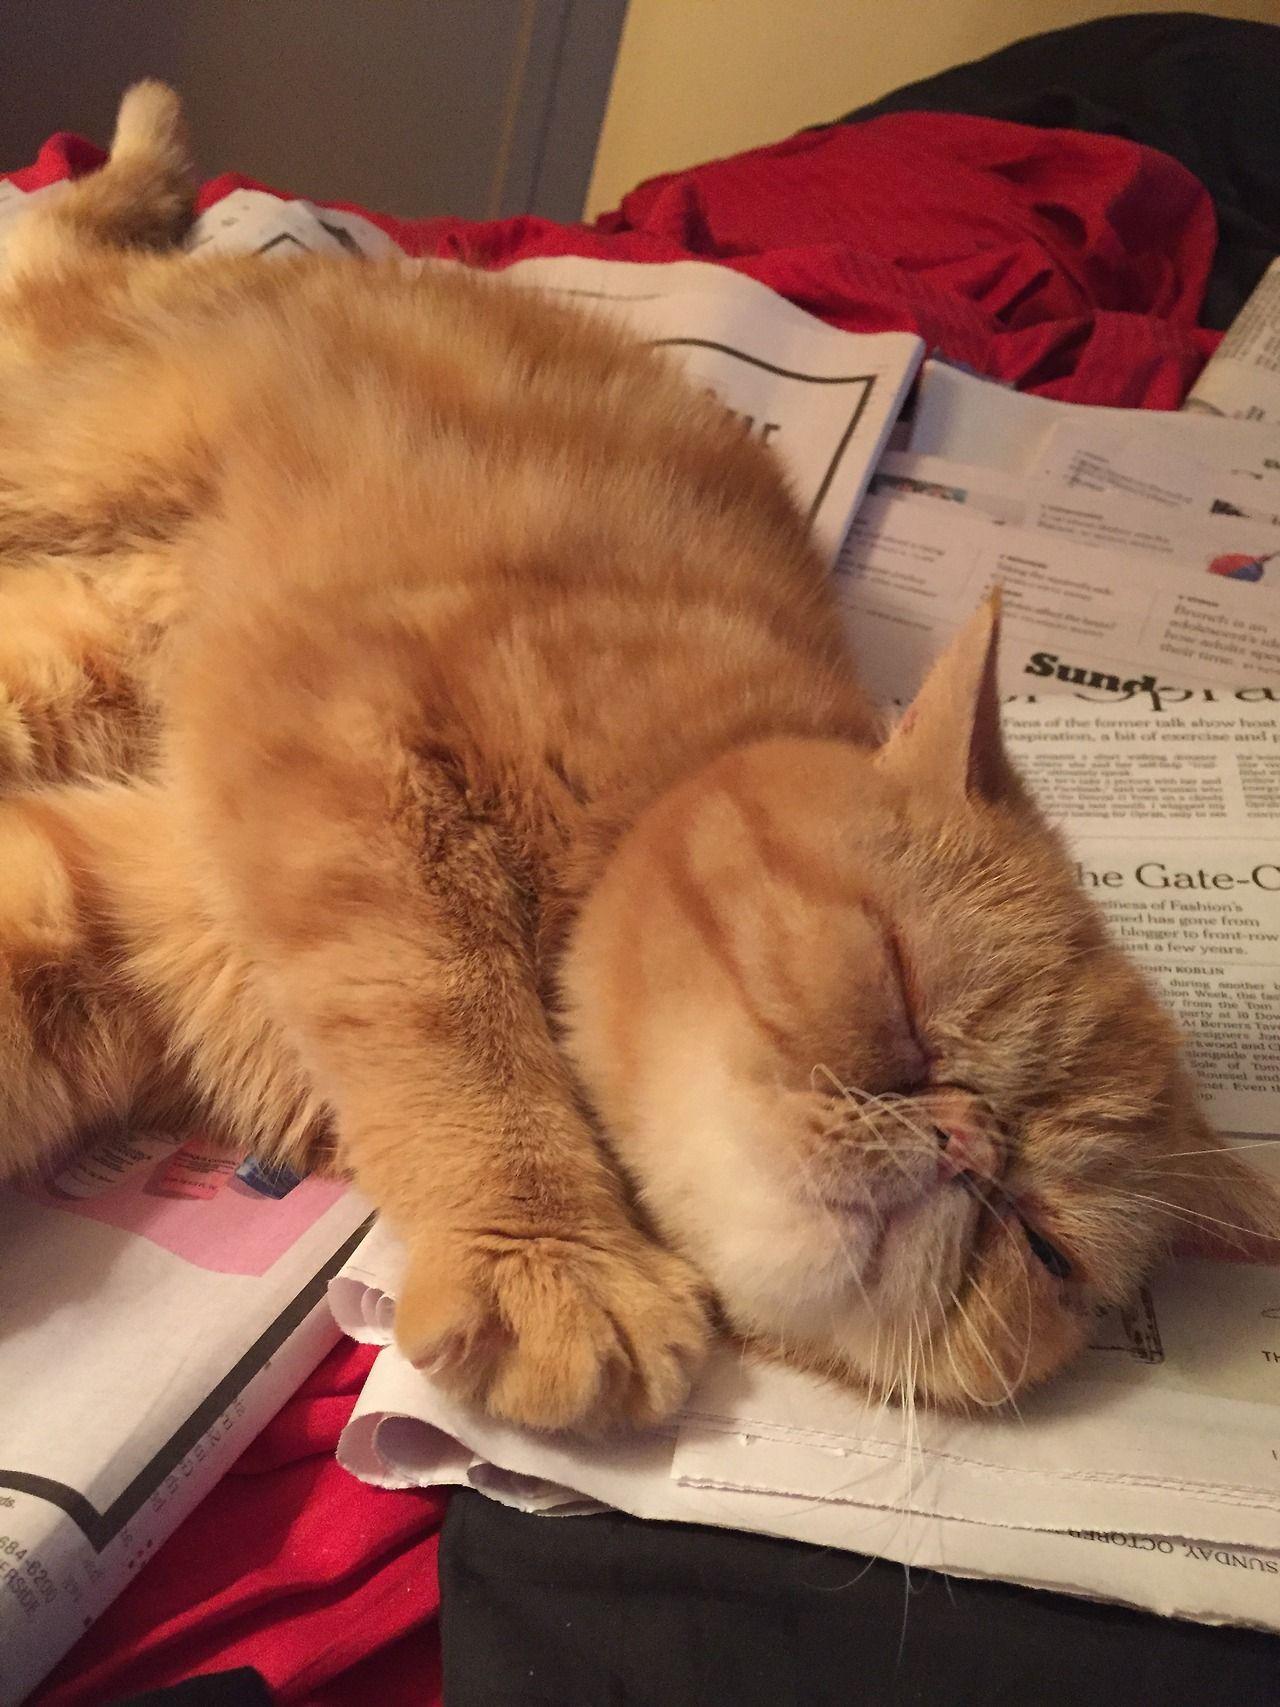 Da news is so oberwhelming. I needz da nap. Cats, Feral